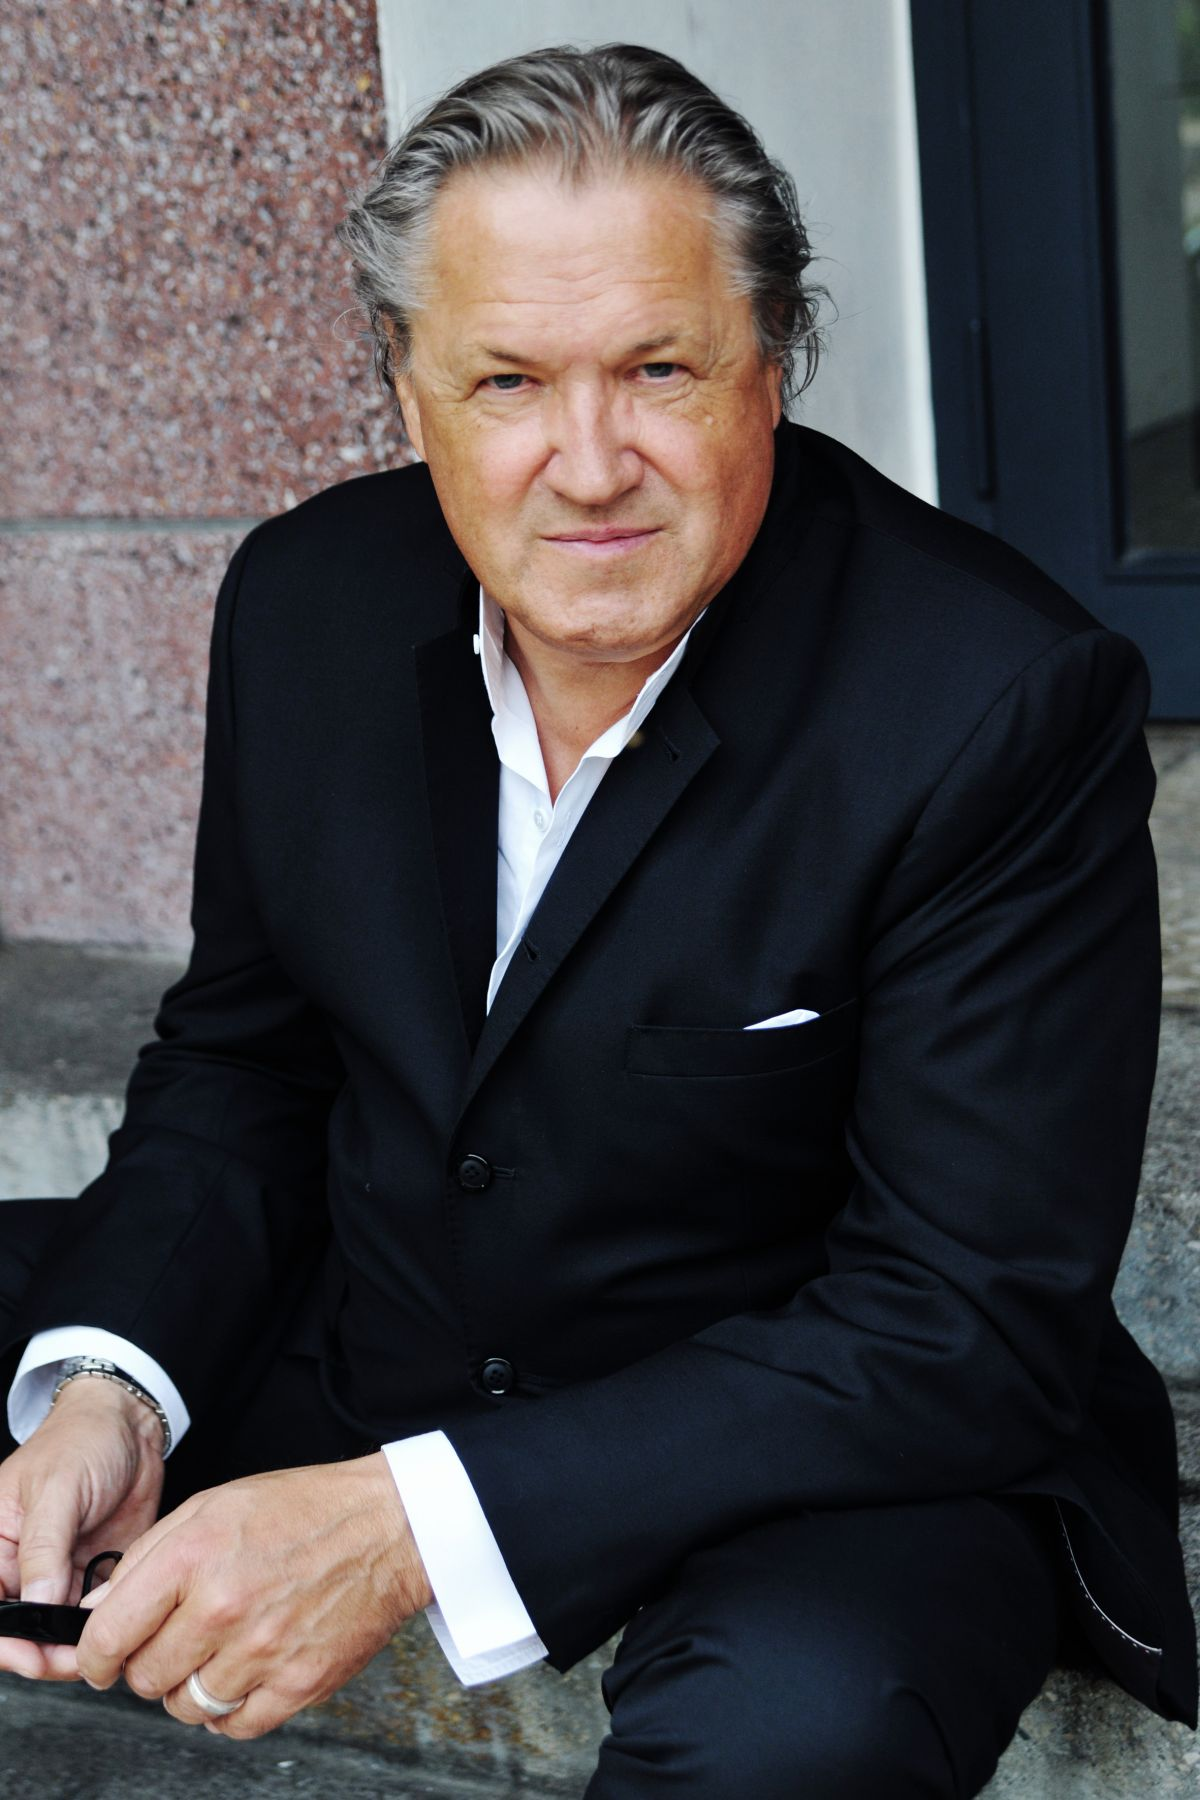 Michael Brandner